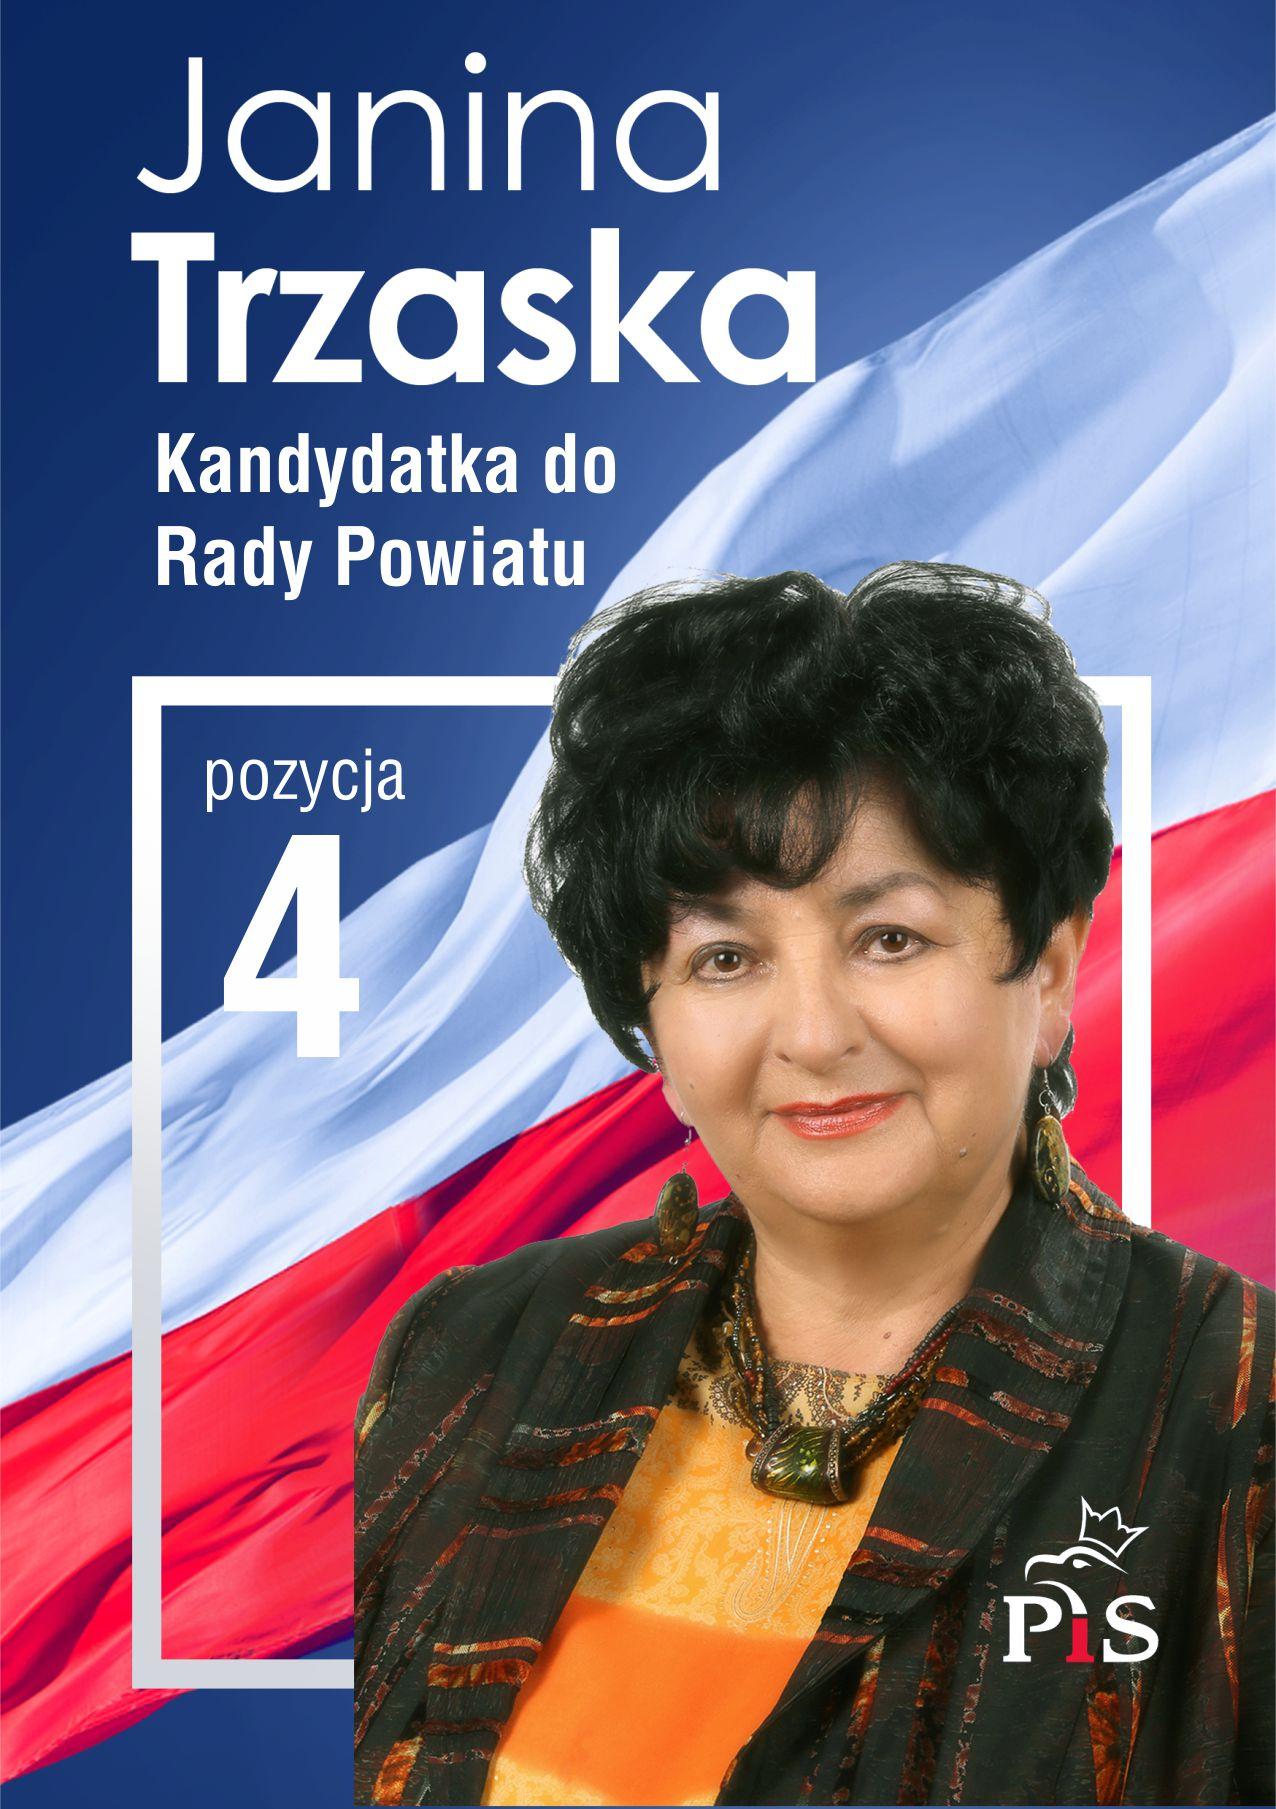 Chrzanow - Trzaska WS2018